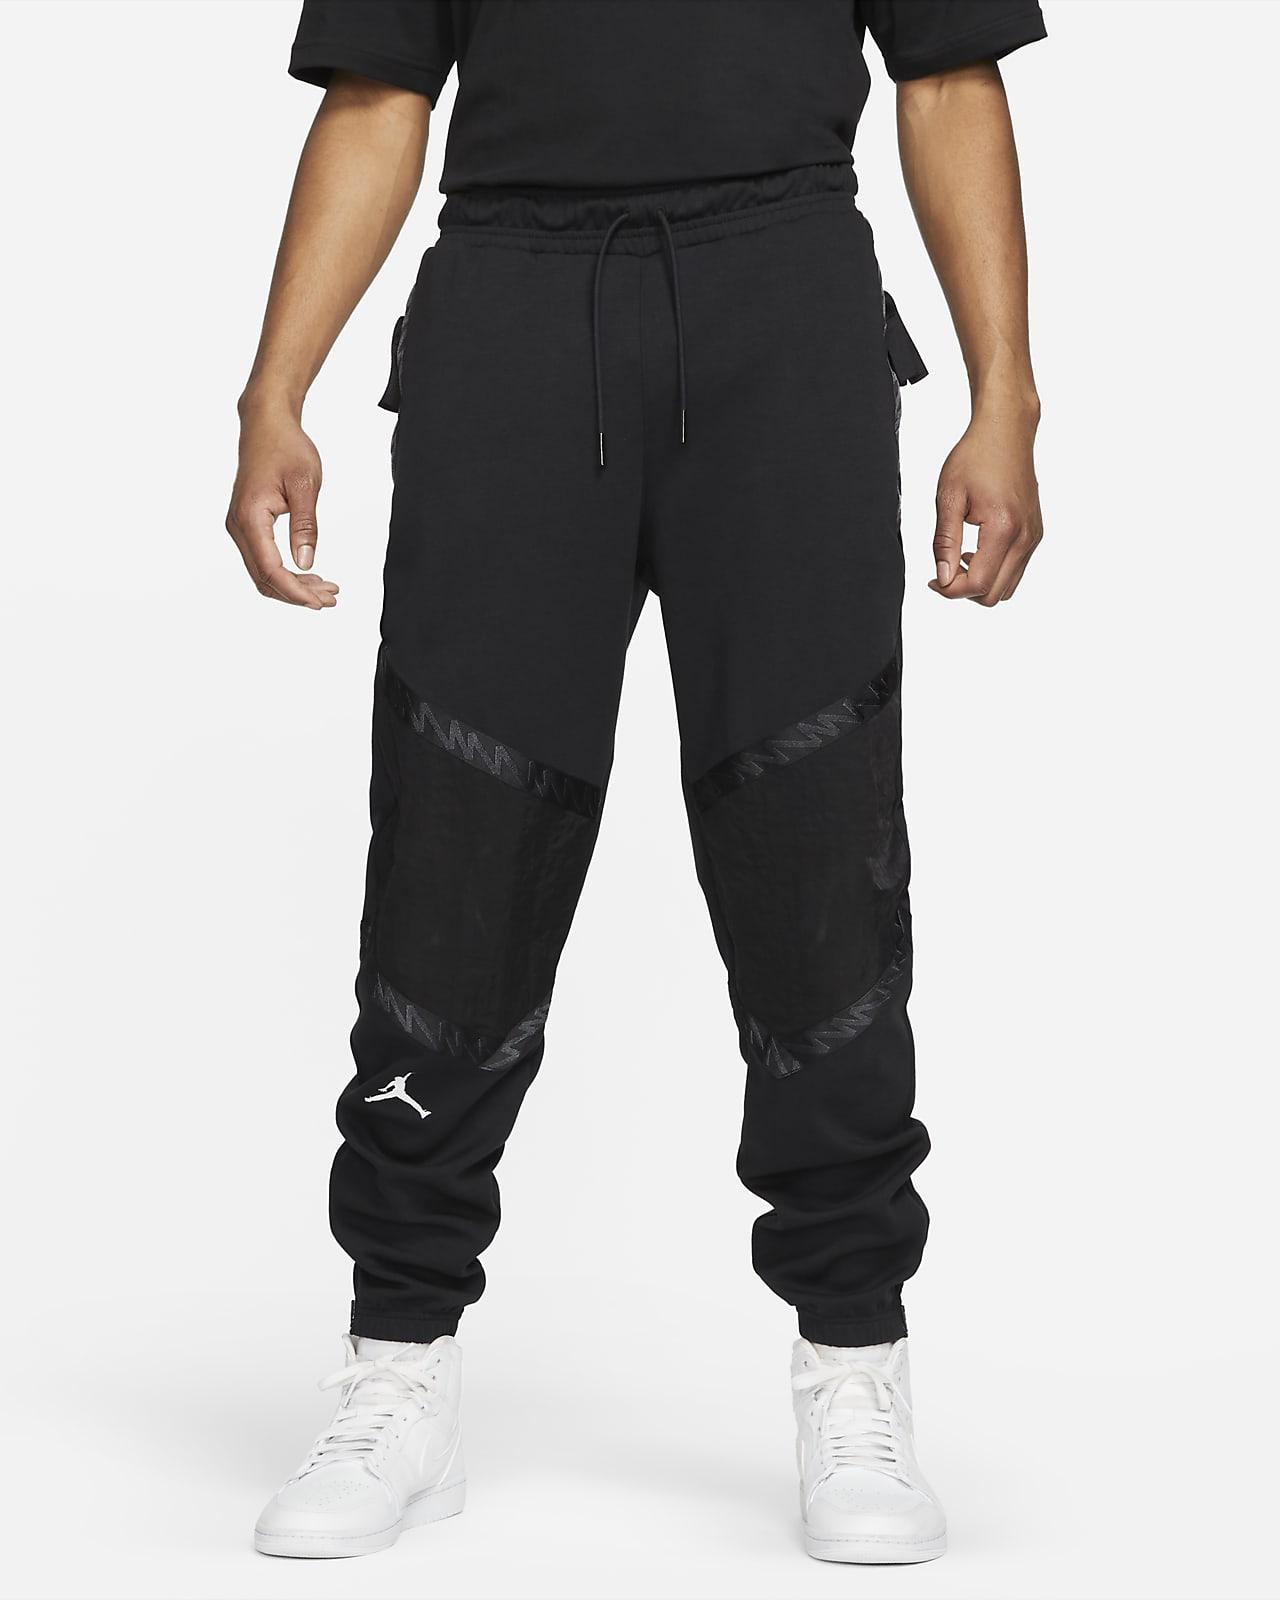 Pantaloni in fleece Jordan Dri-FIT Zion - Uomo